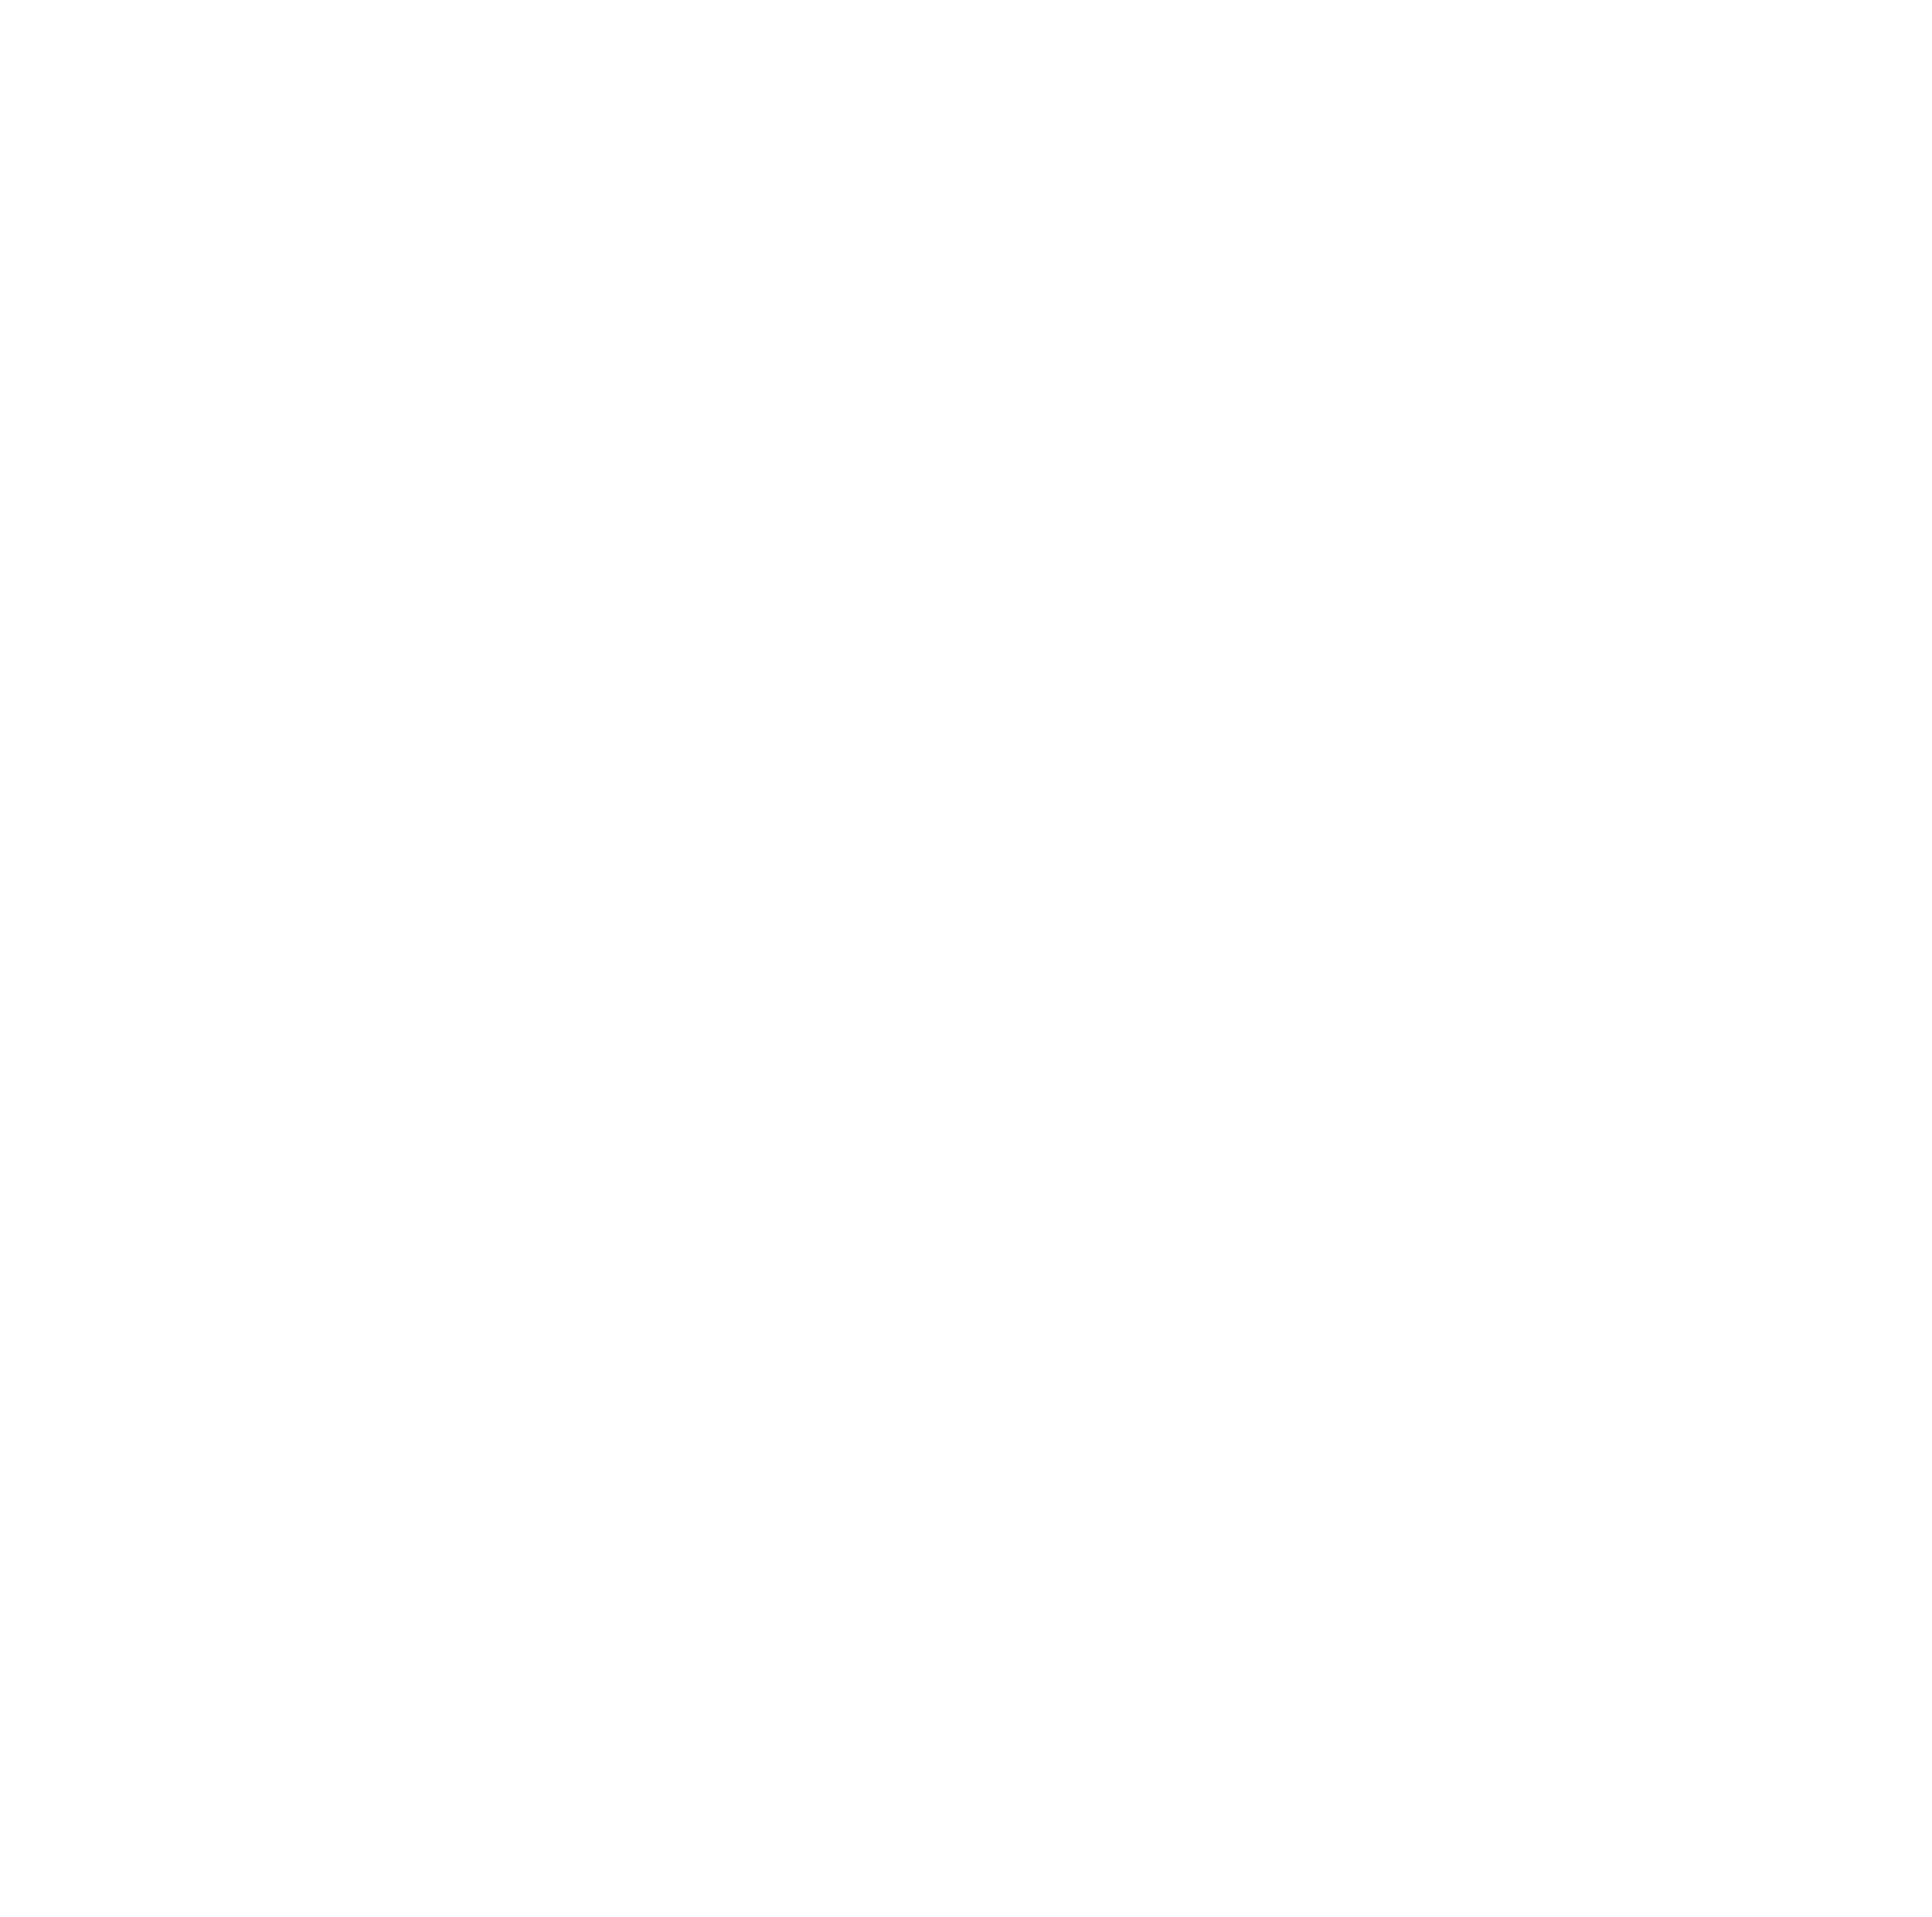 Concourse Logo PNG Transparent & SVG Vector - Freebie Supply